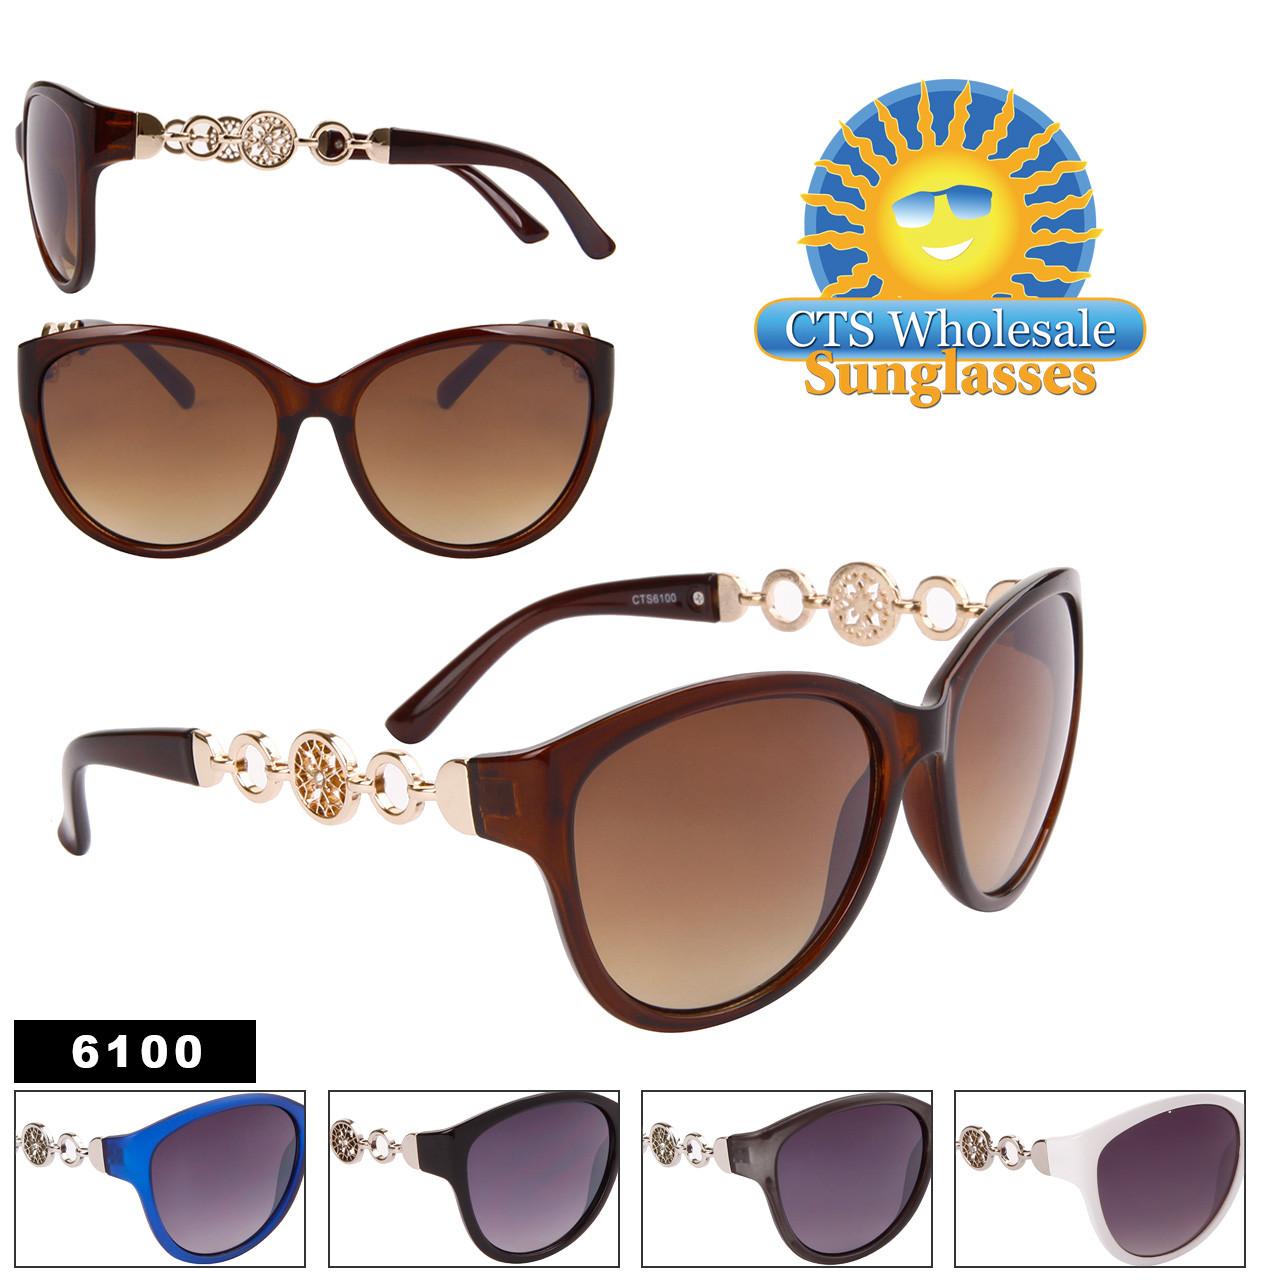 Women's Rhinestone Sunglasses in Bulk - 6100